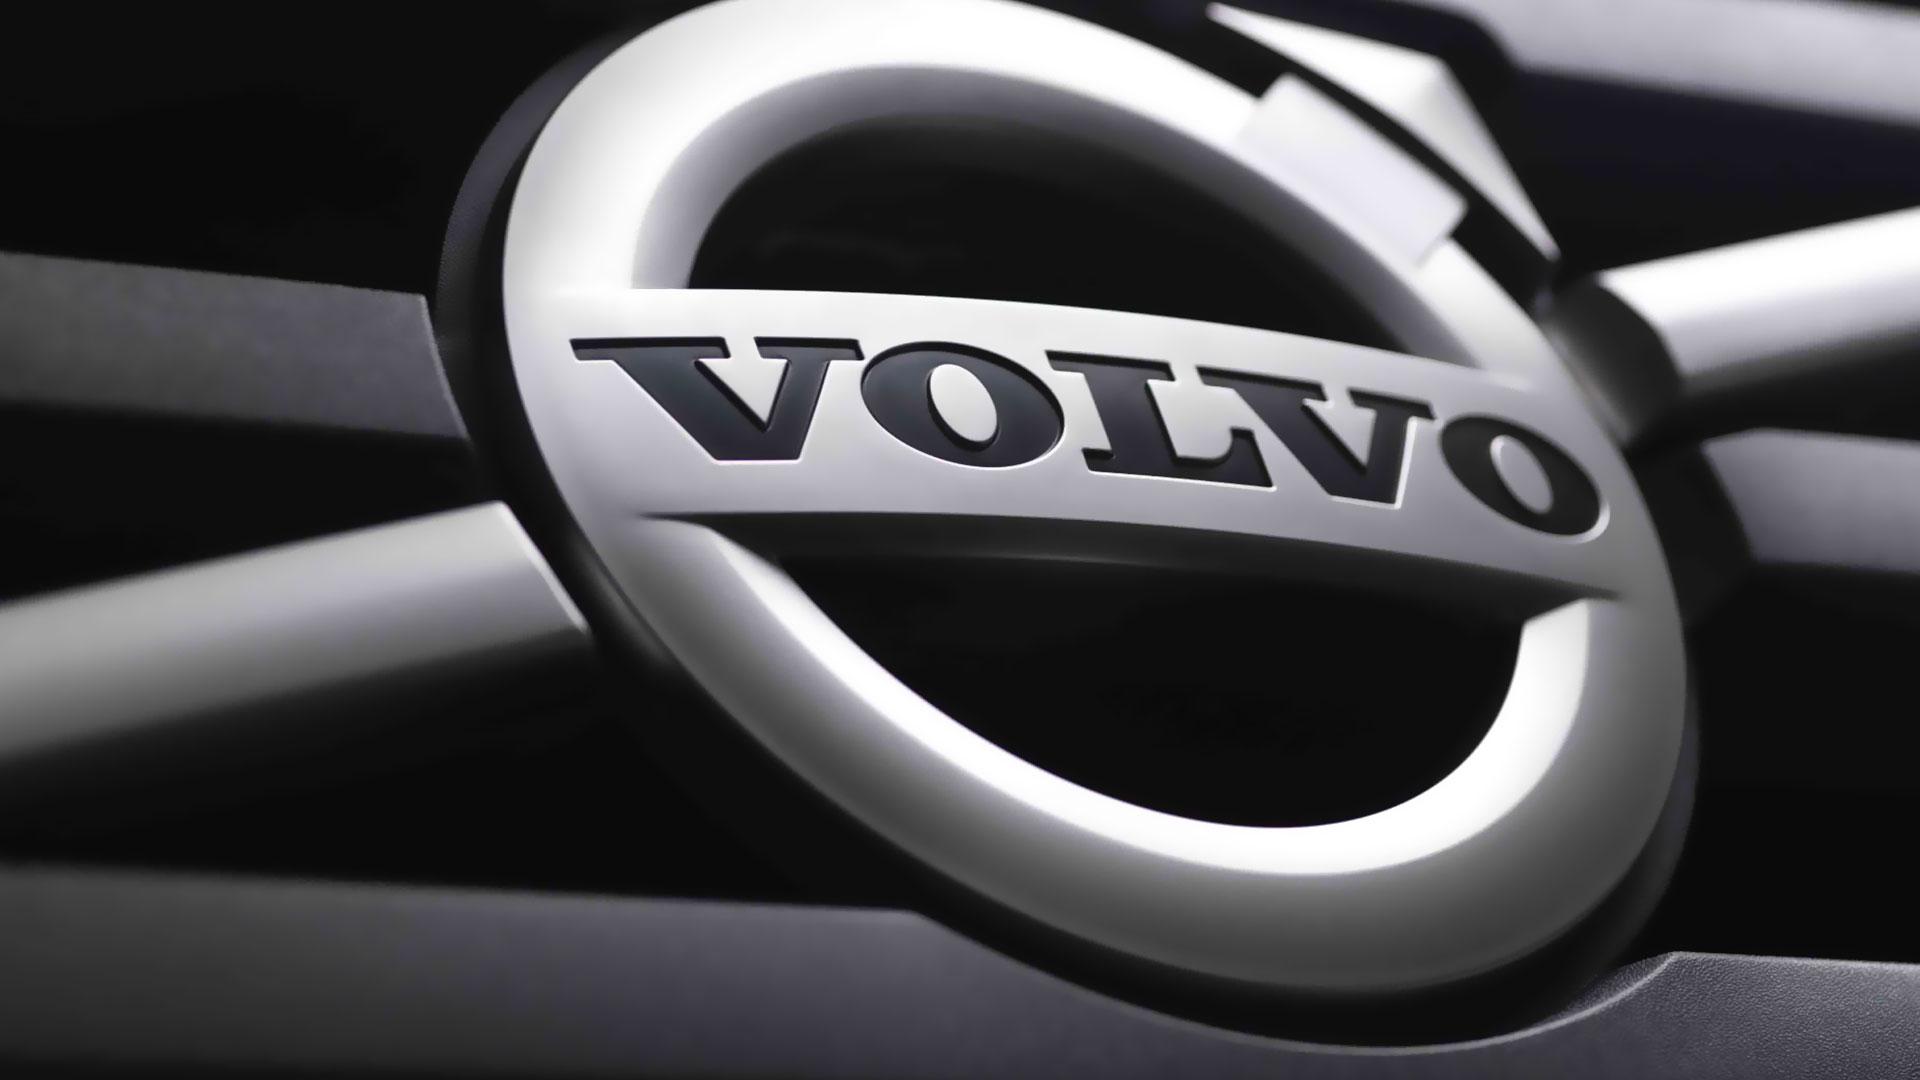 Full Hd Car Logos Wallpapers 4 Hd Volvo Logo Wallpapers